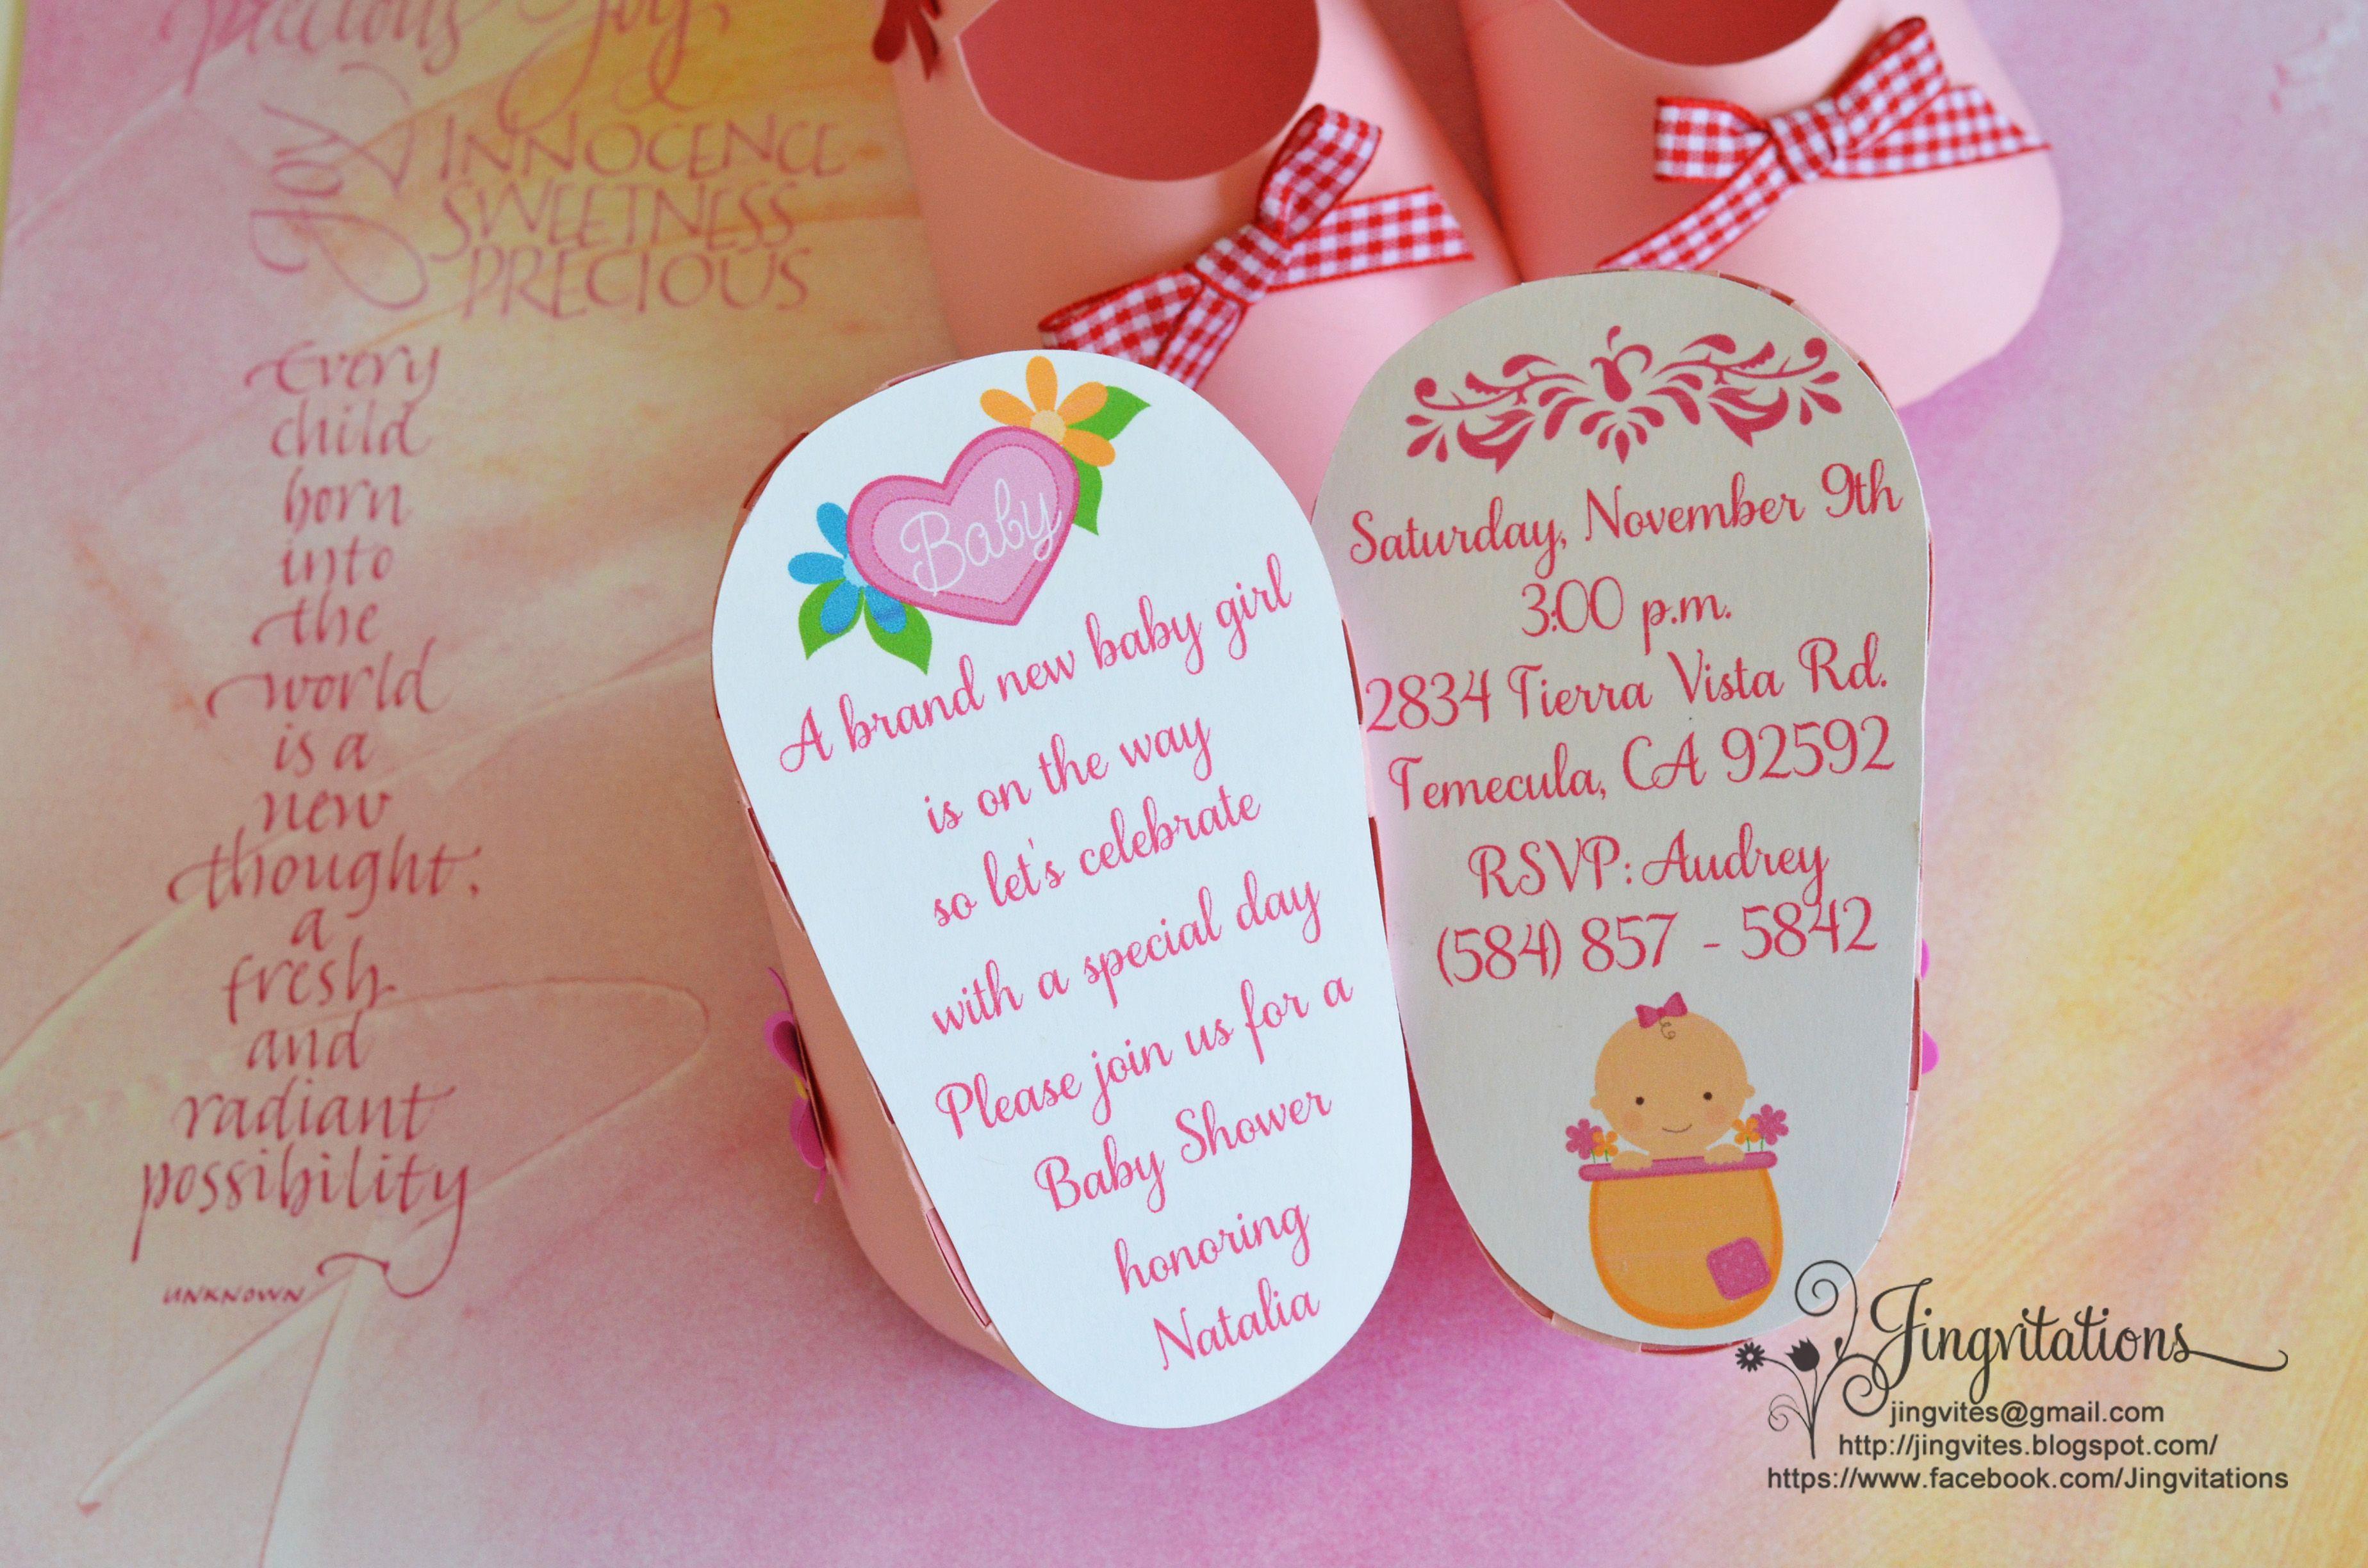 3d Invitations Very Unique Baby Shoe Invites For Baby Shower Baby Shower Invitation Cards Baby Shower Invitations Diy Baby Shower Invitation Wording